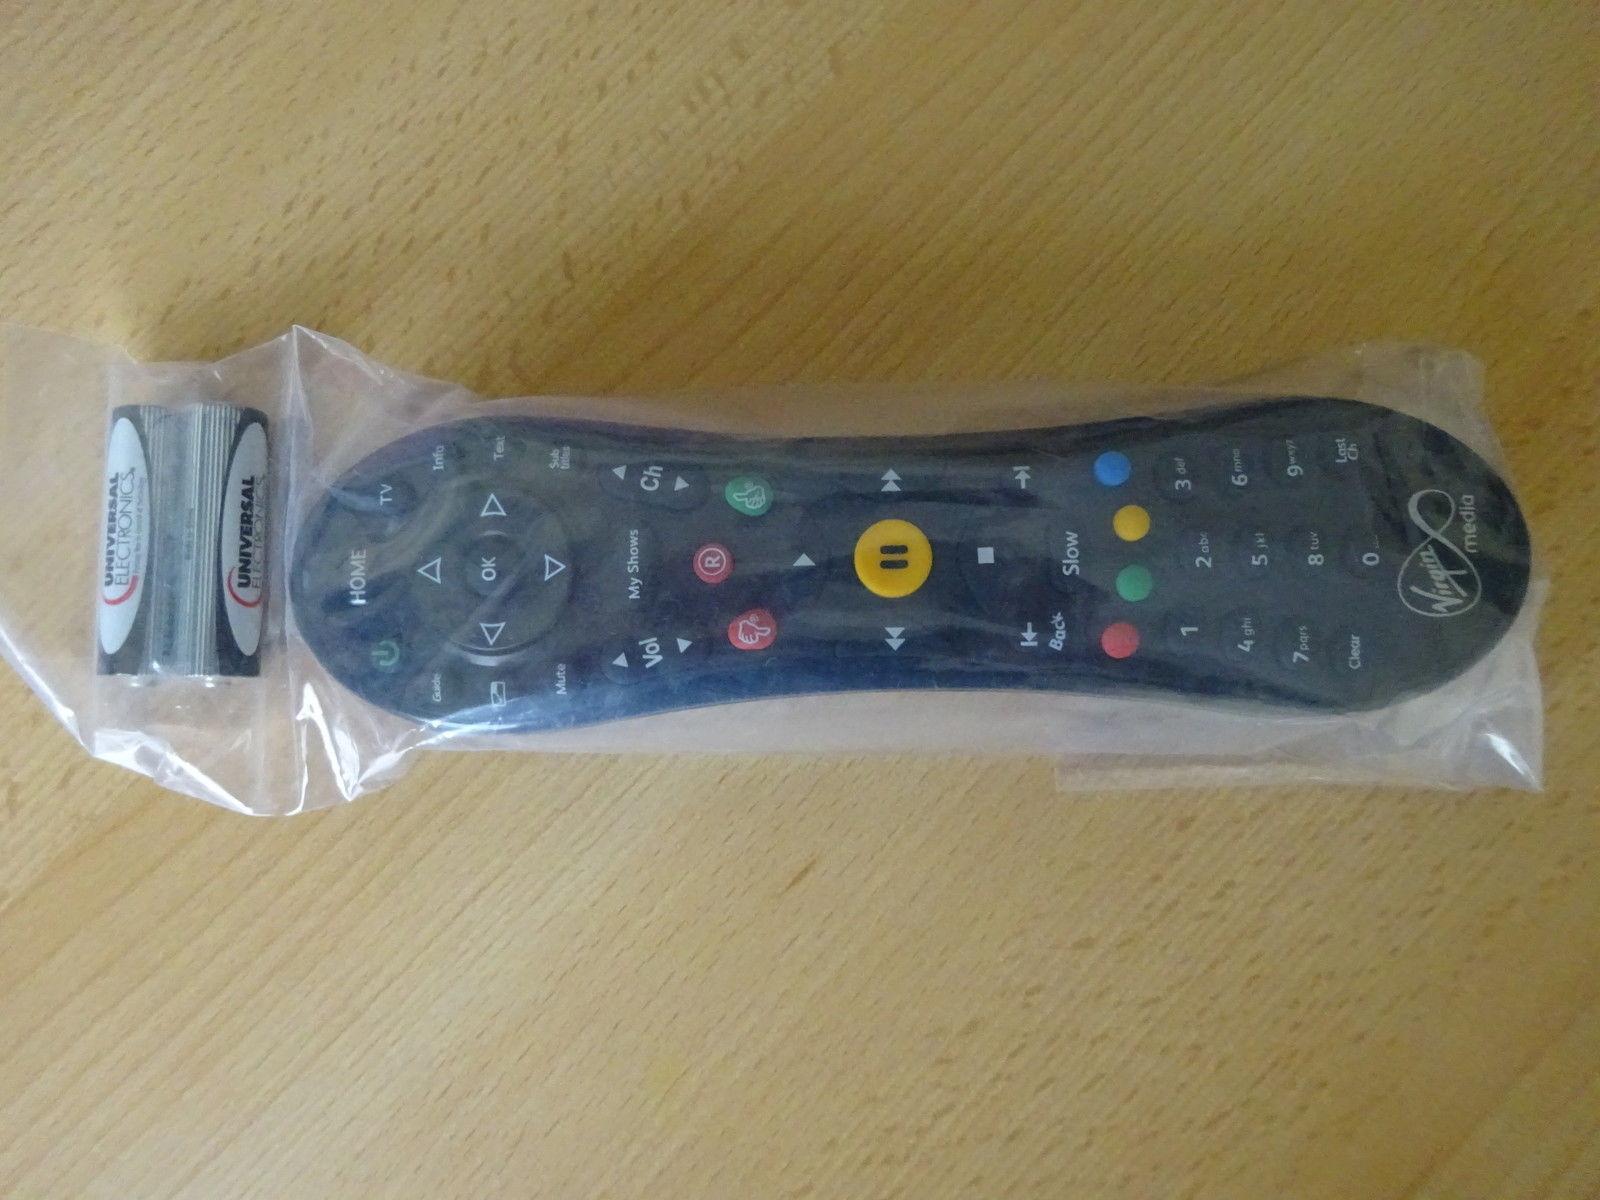 BRAND NEW Genuine Virgin Media TIVO Remote WITH FREE BATTERIES *1 year warranty